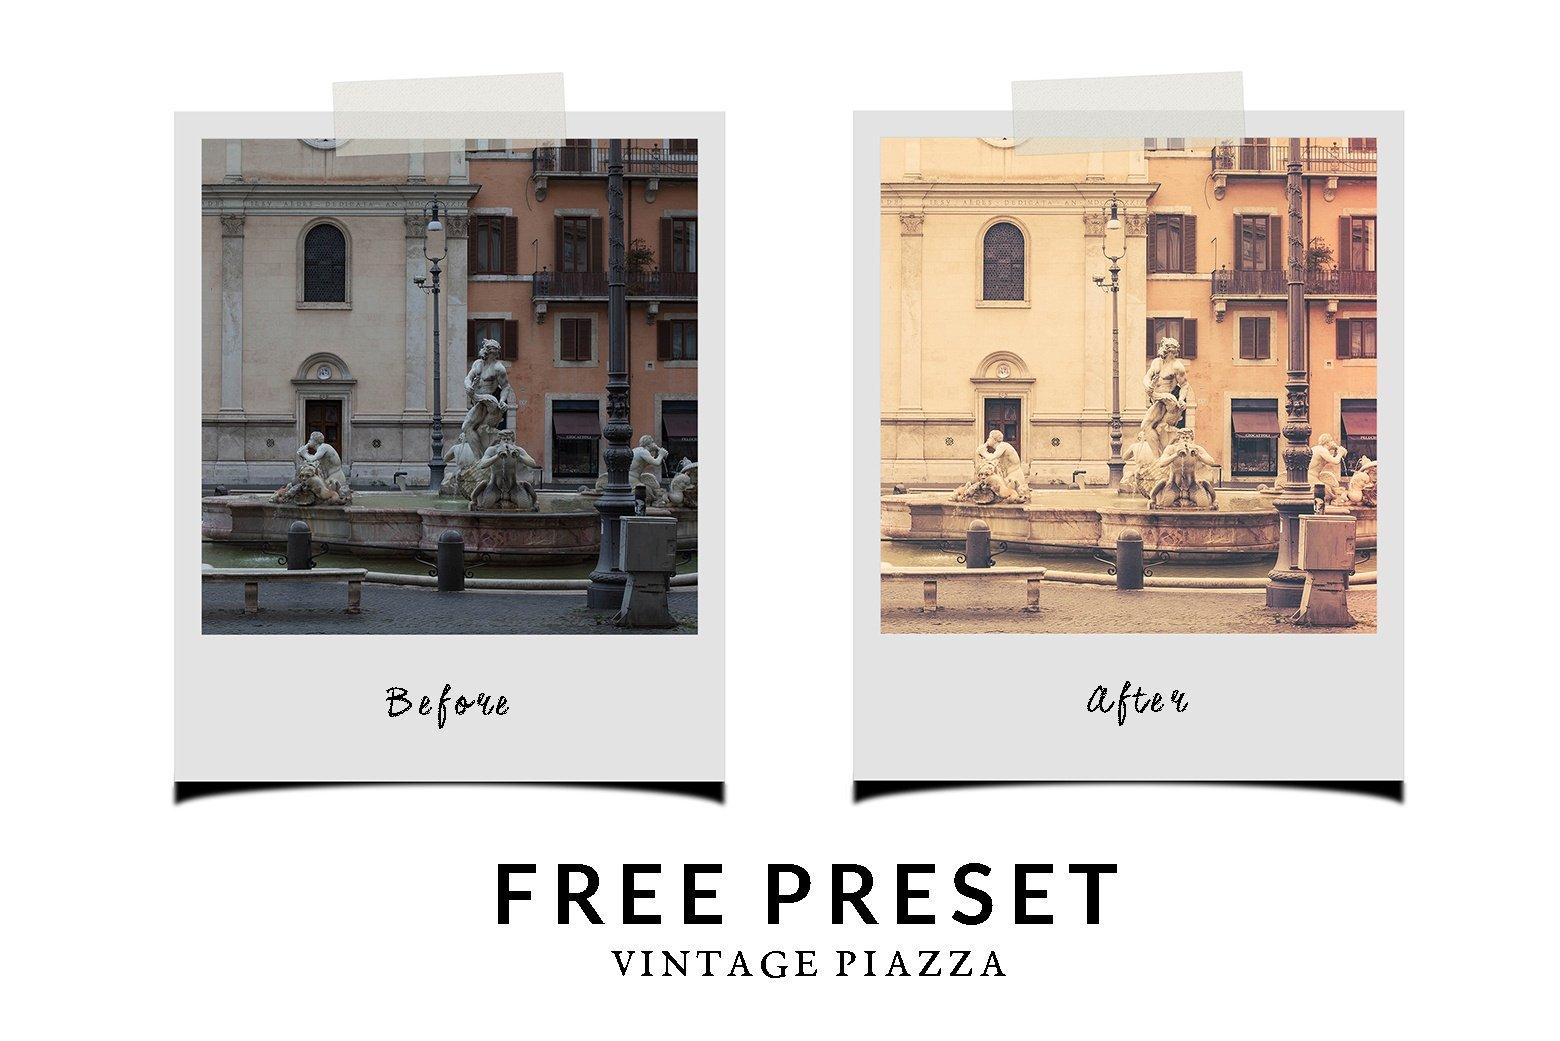 free-chic-preset-vintage-piazza